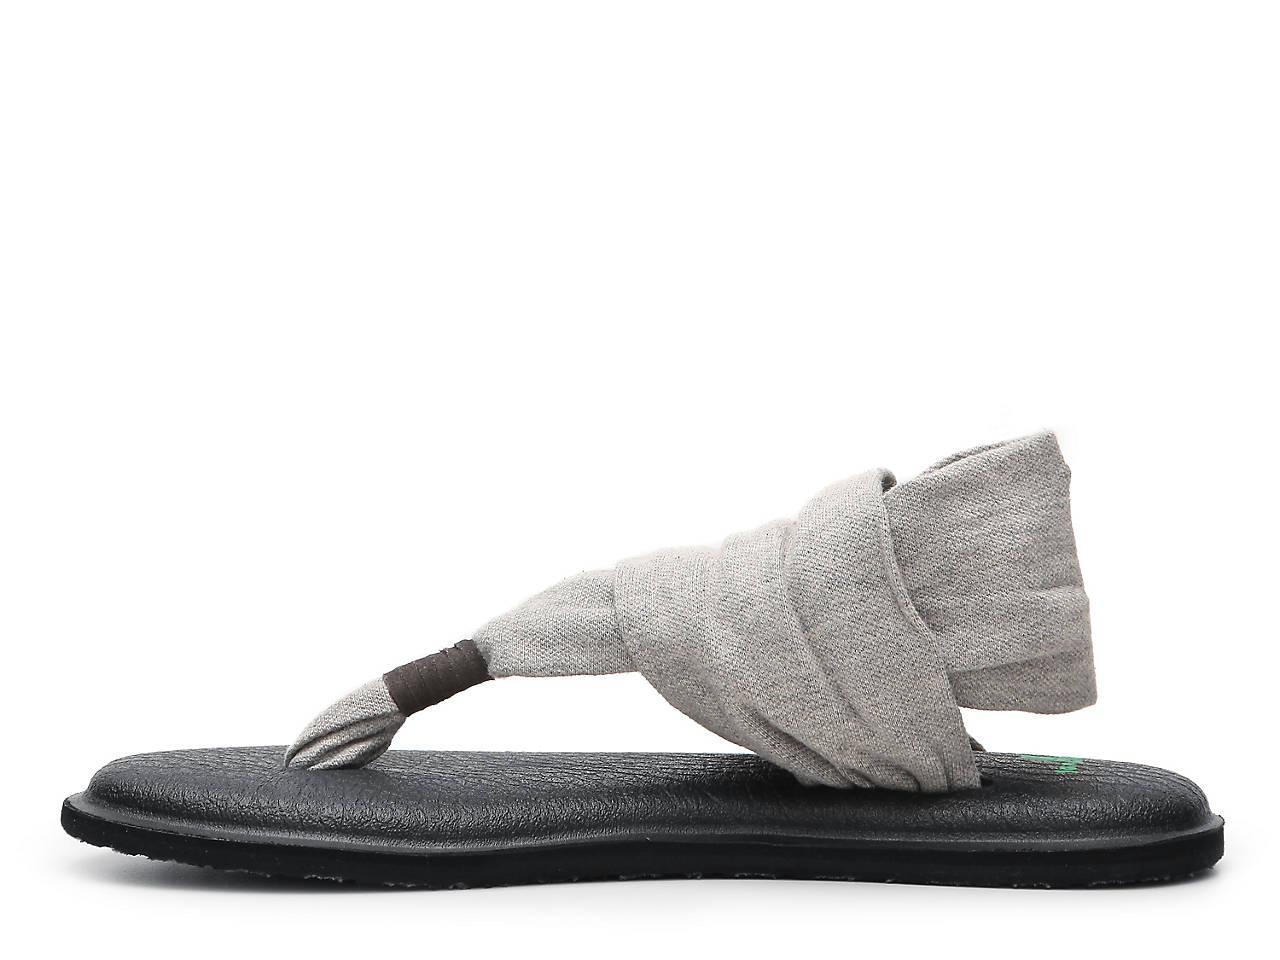 Womens sandals narrow - Womens Sandals Narrow 56